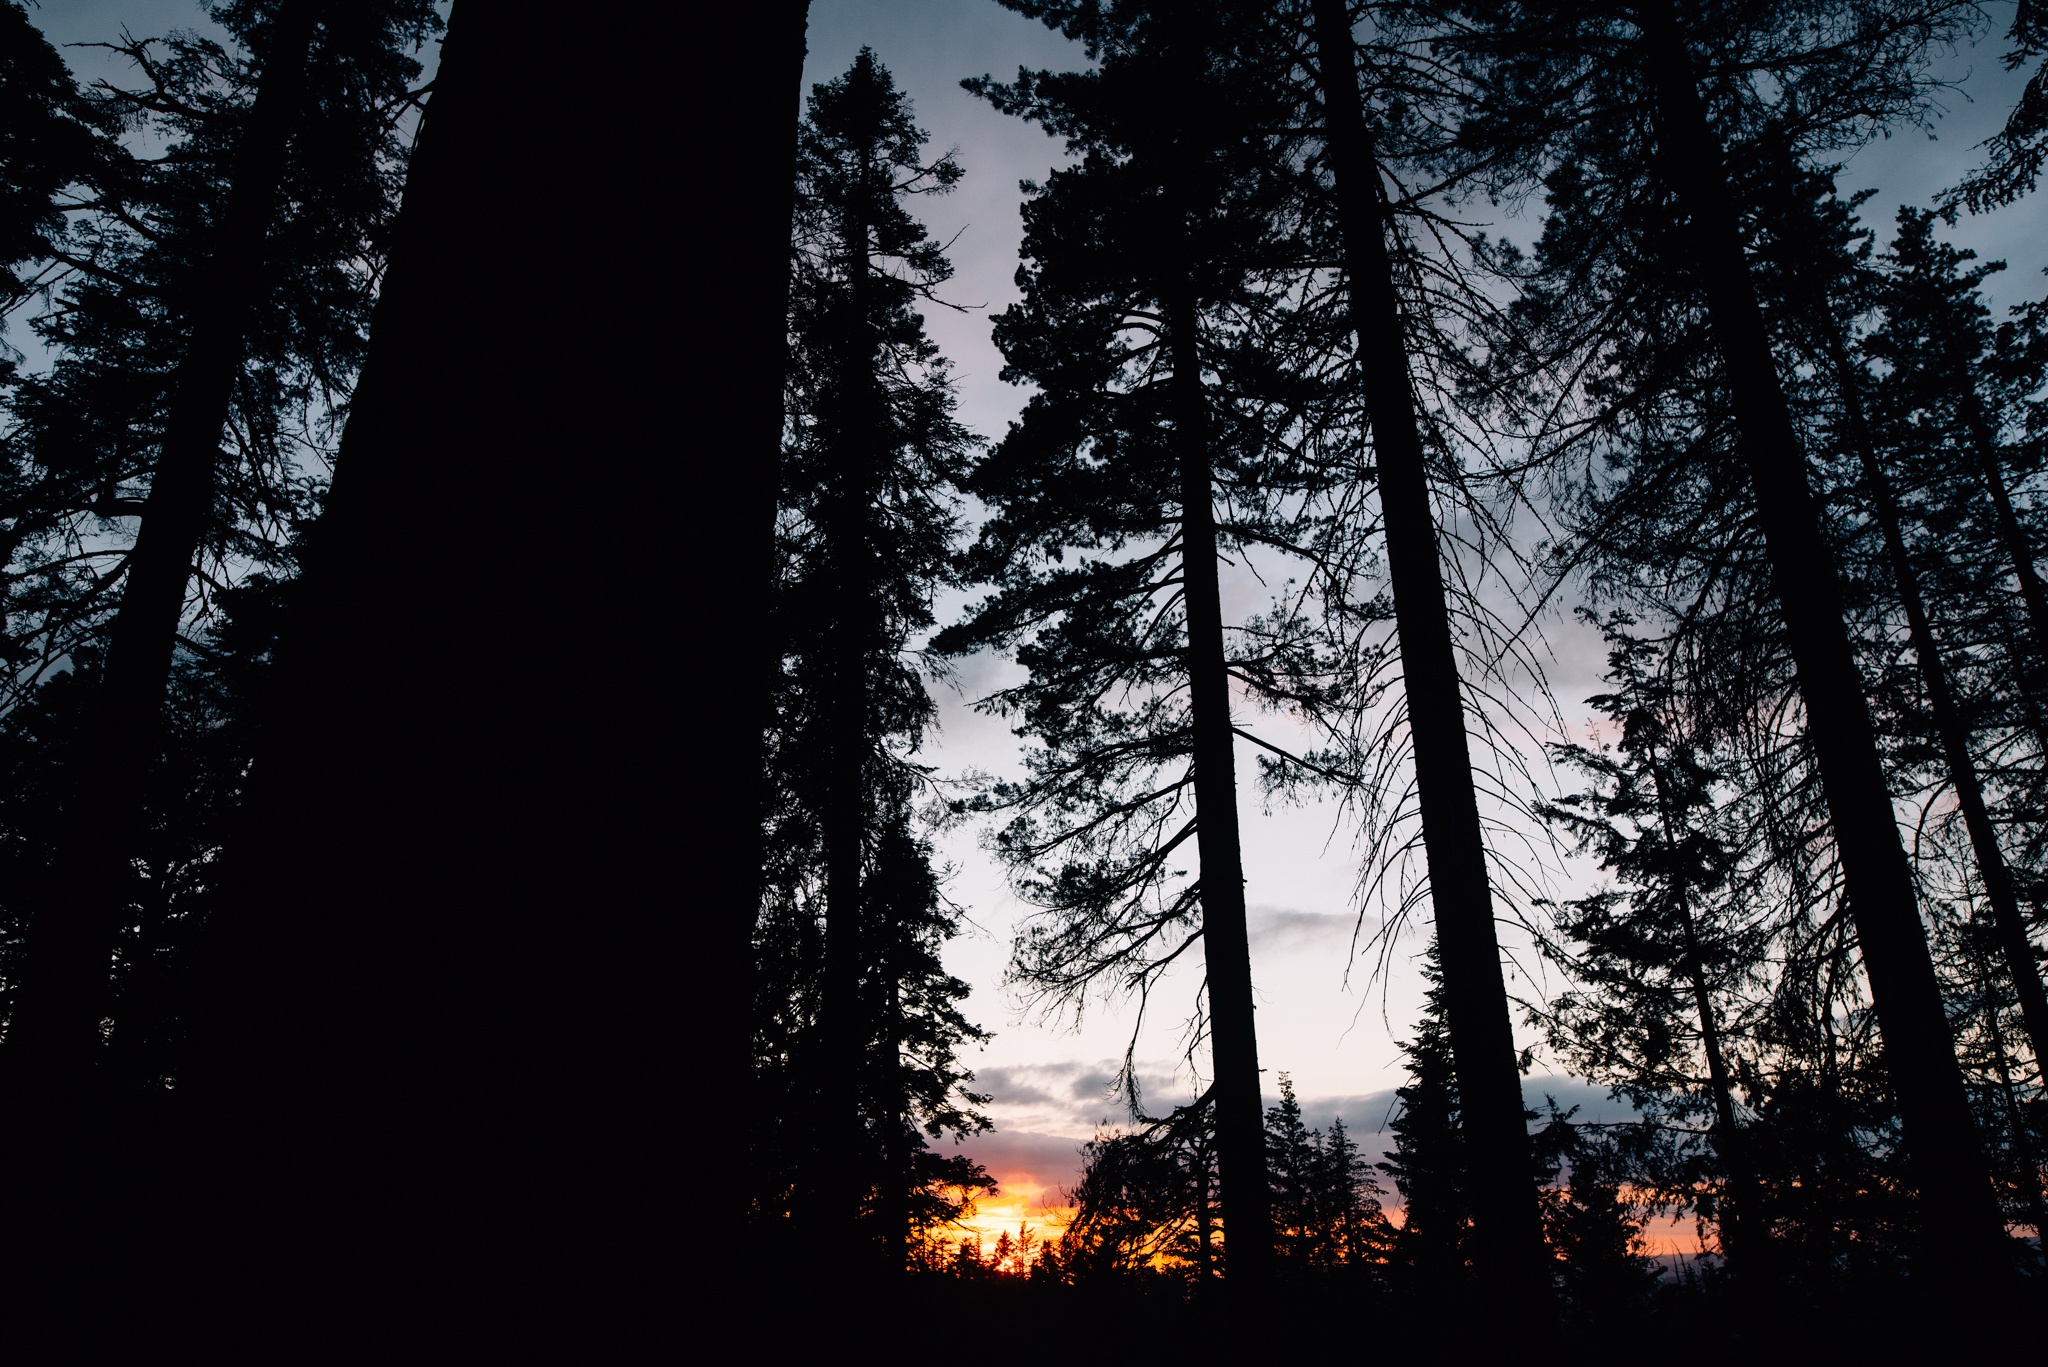 ©The Ryans Photography - Los Angeles Travel - Tuolomne Meadows Yosemite-044.jpg